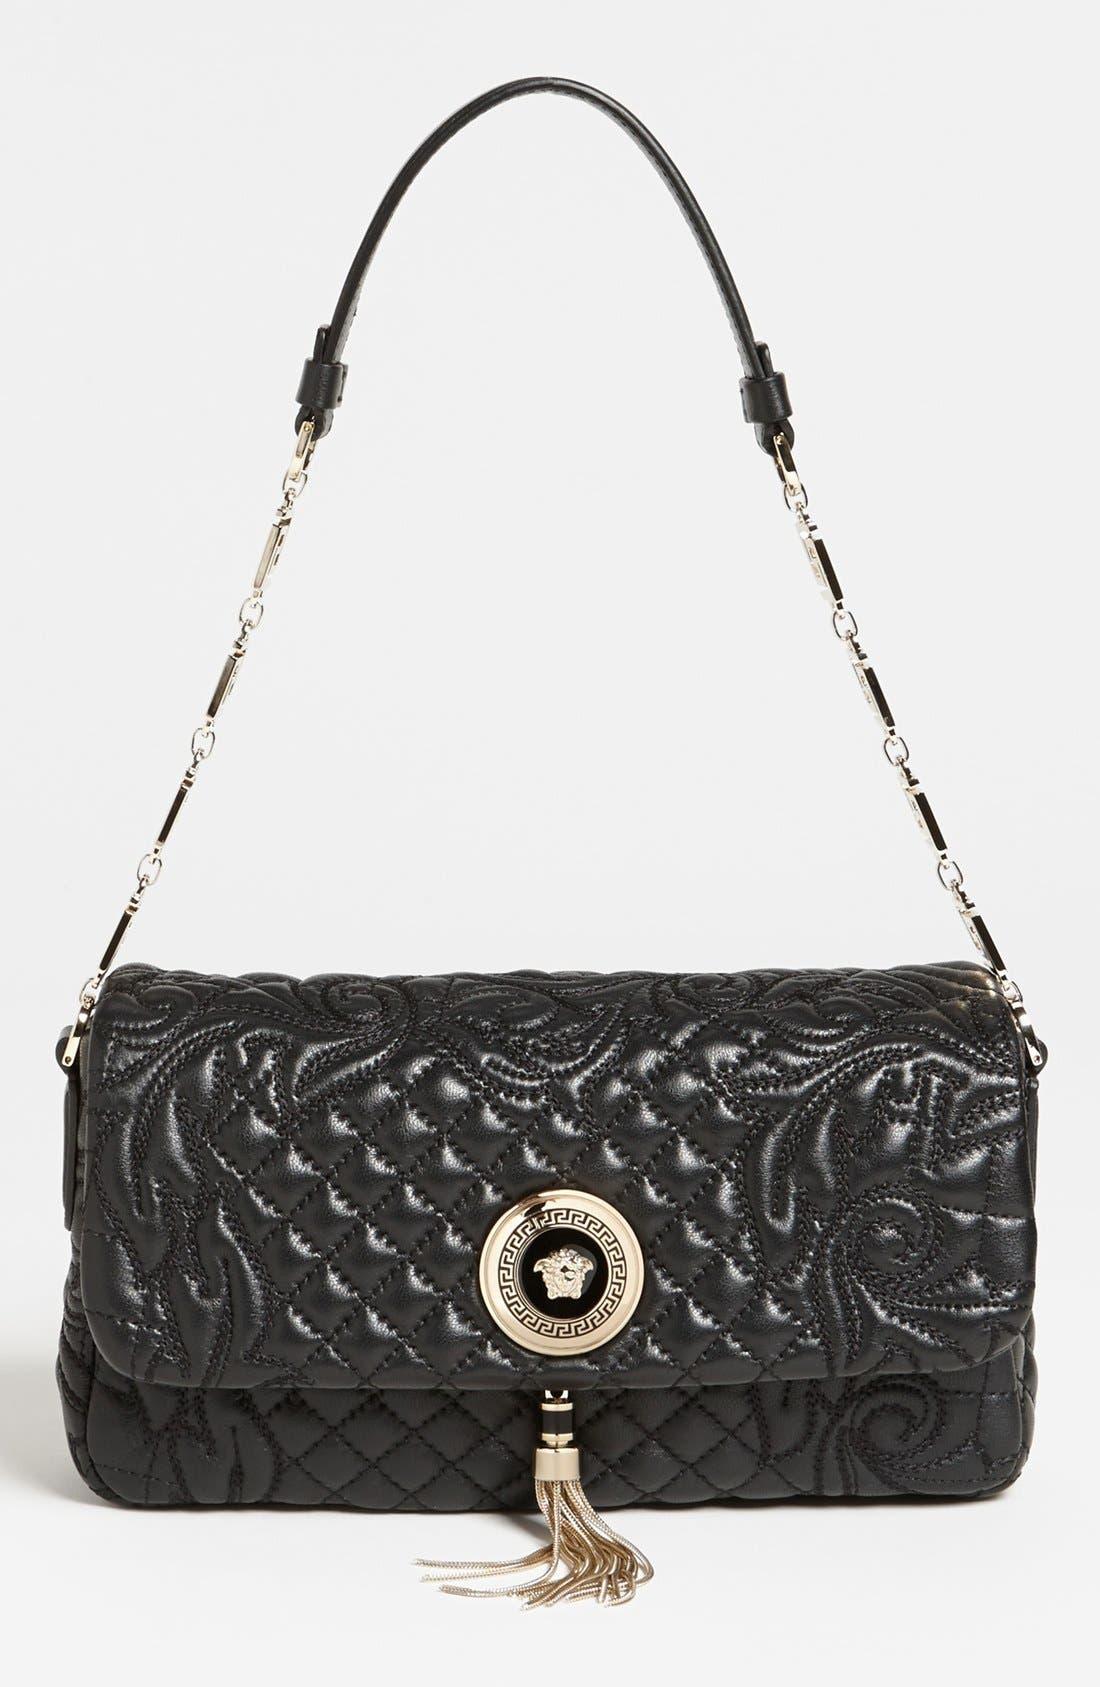 Main Image - Versace 'Linea' Leather Shoulder Bag